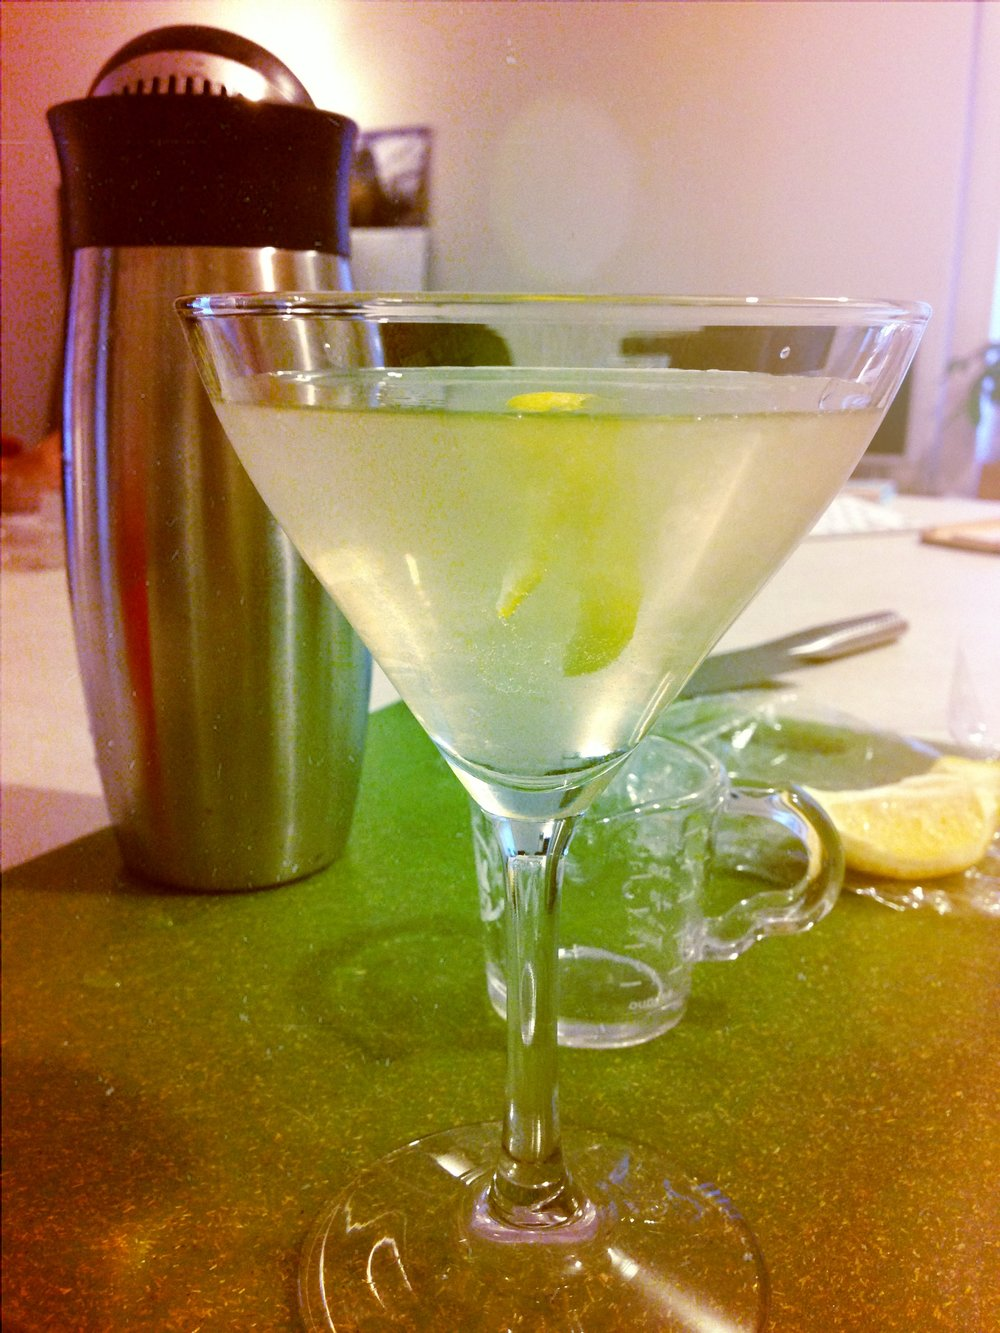 Classic Martini with lemon twist